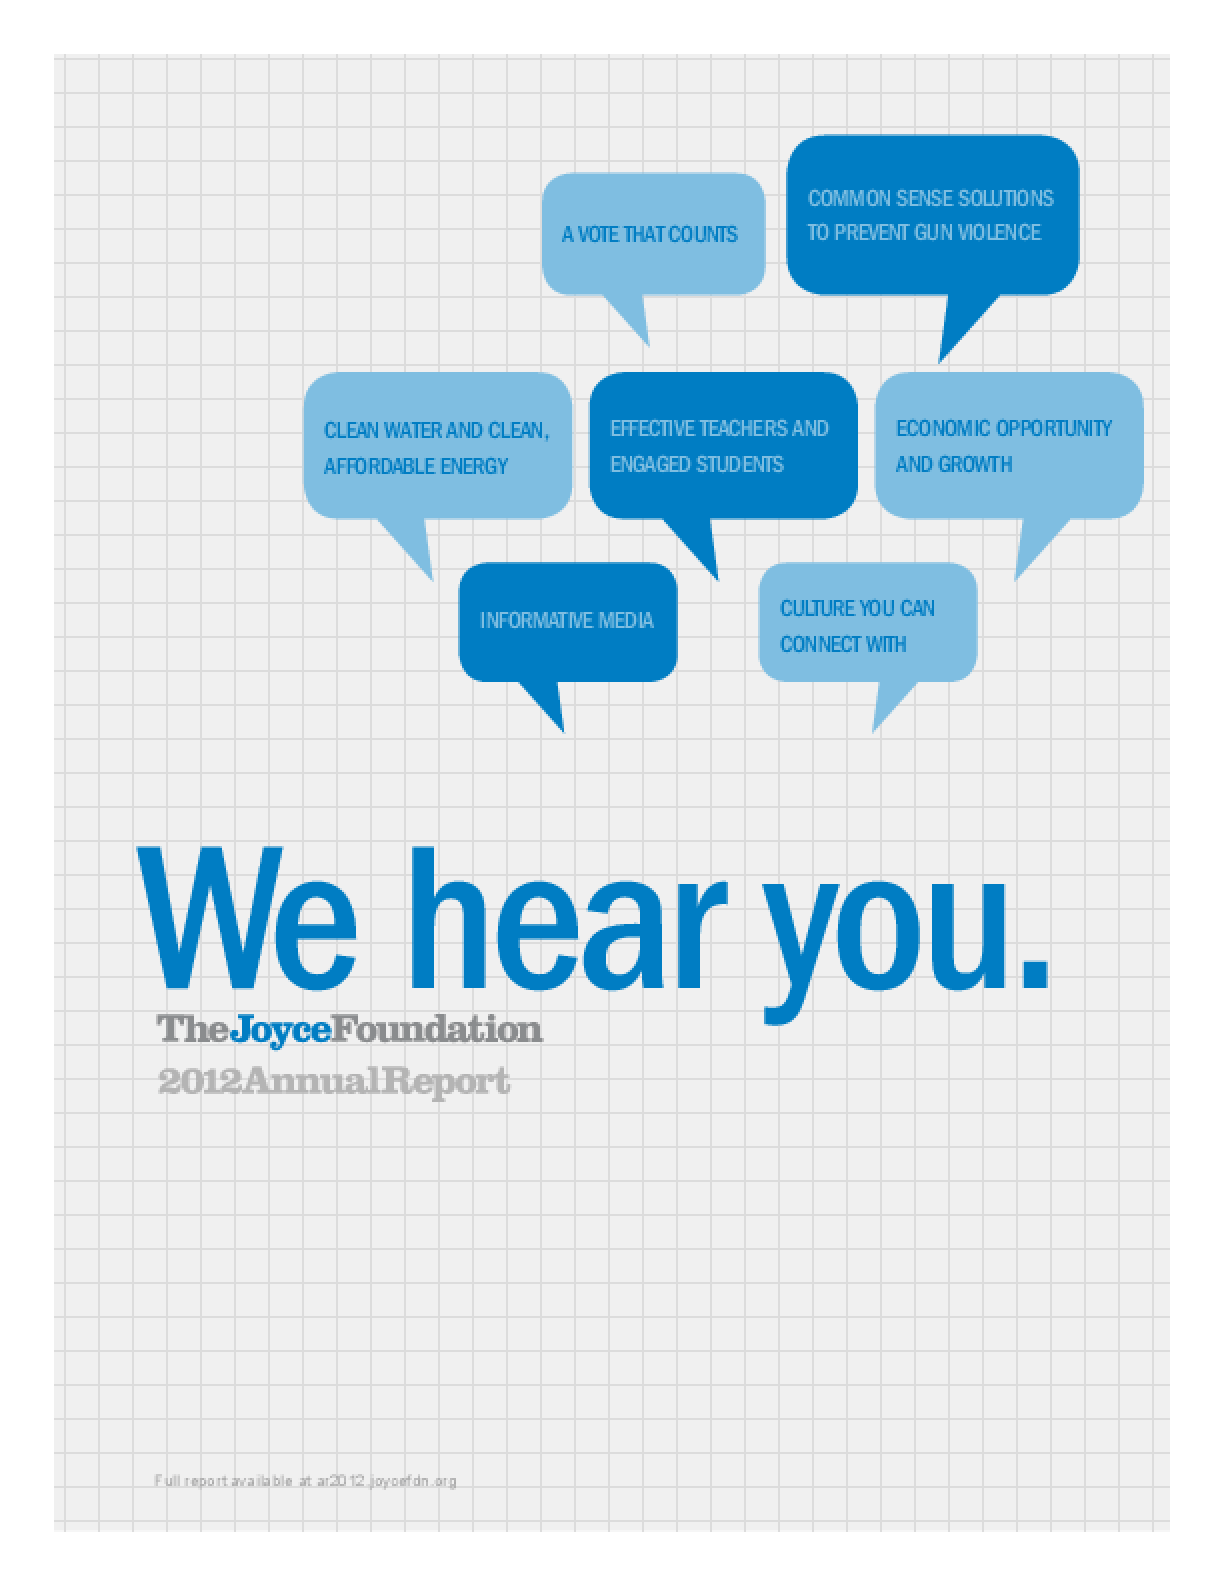 We Hear You: Joyce Foundation 2012 Annual Report